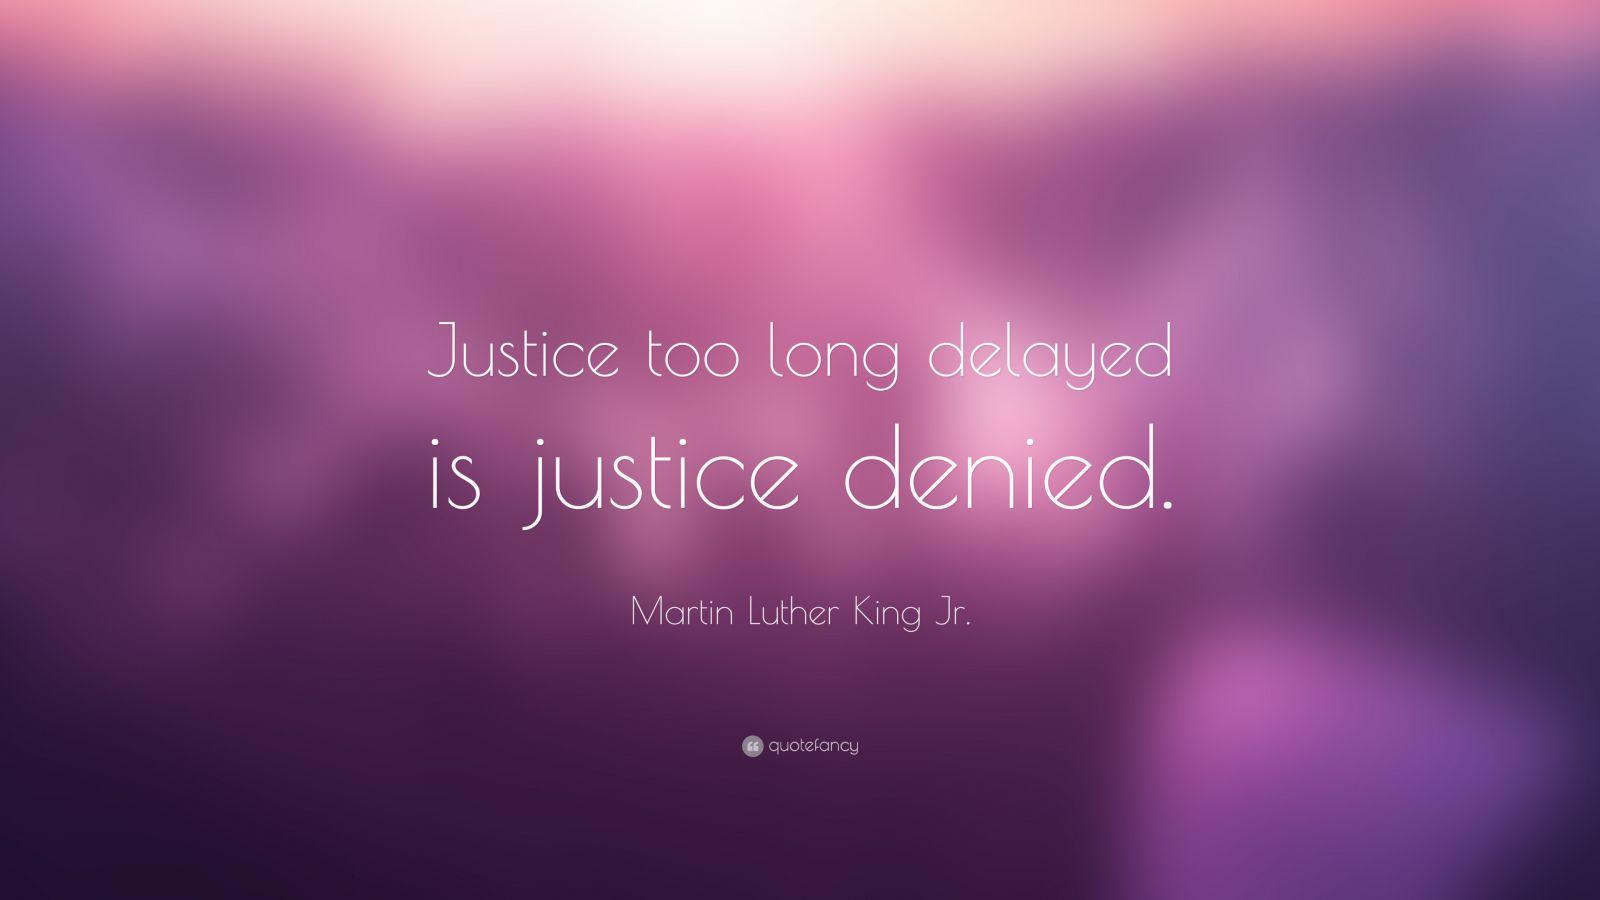 justice delayed is justice denied debate